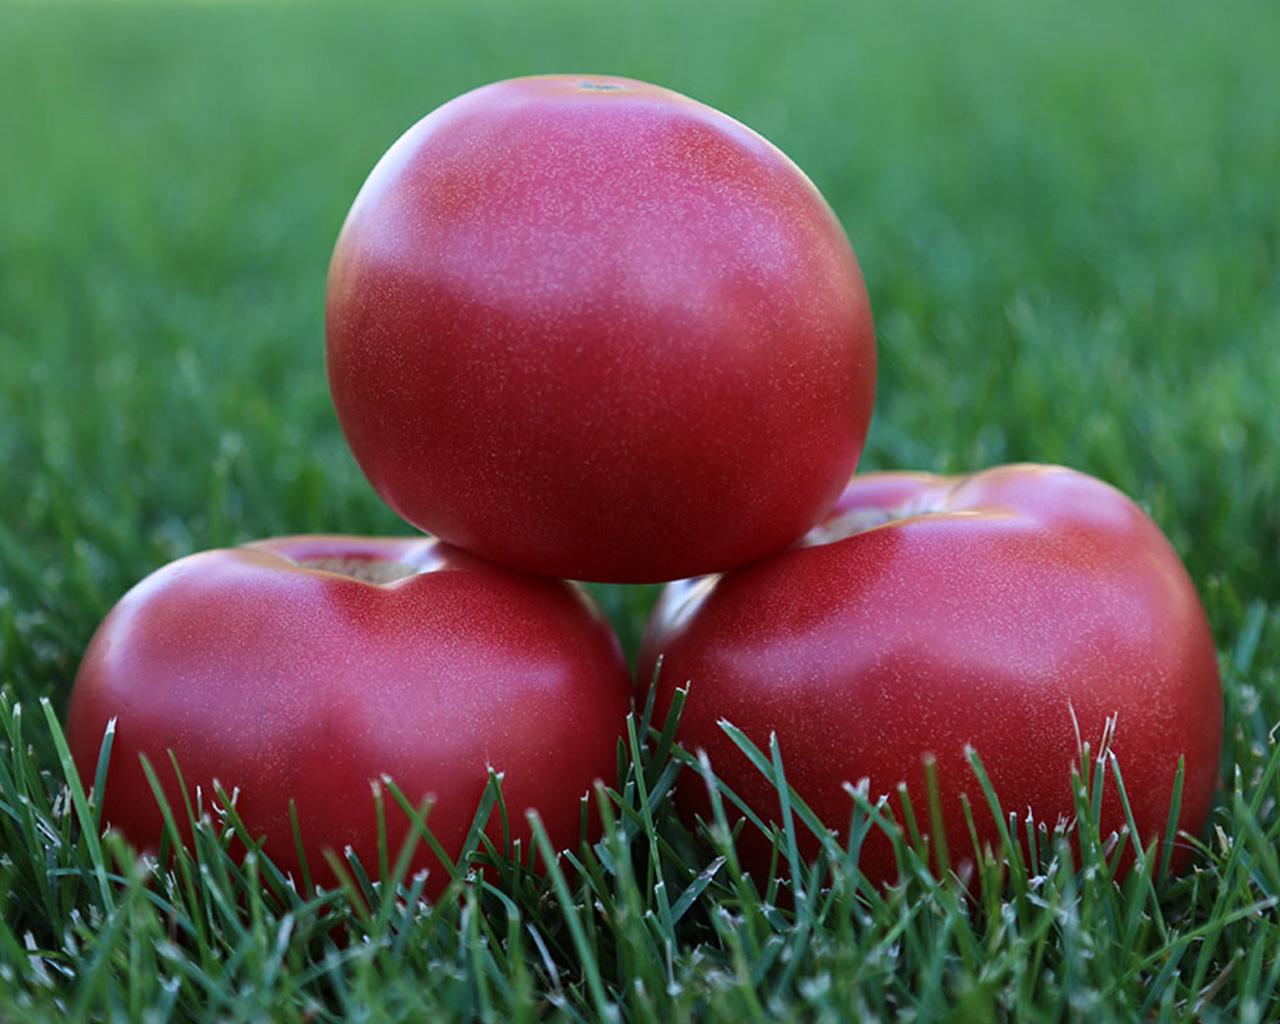 Голландский гибрид: сорт помидор пинк уникум